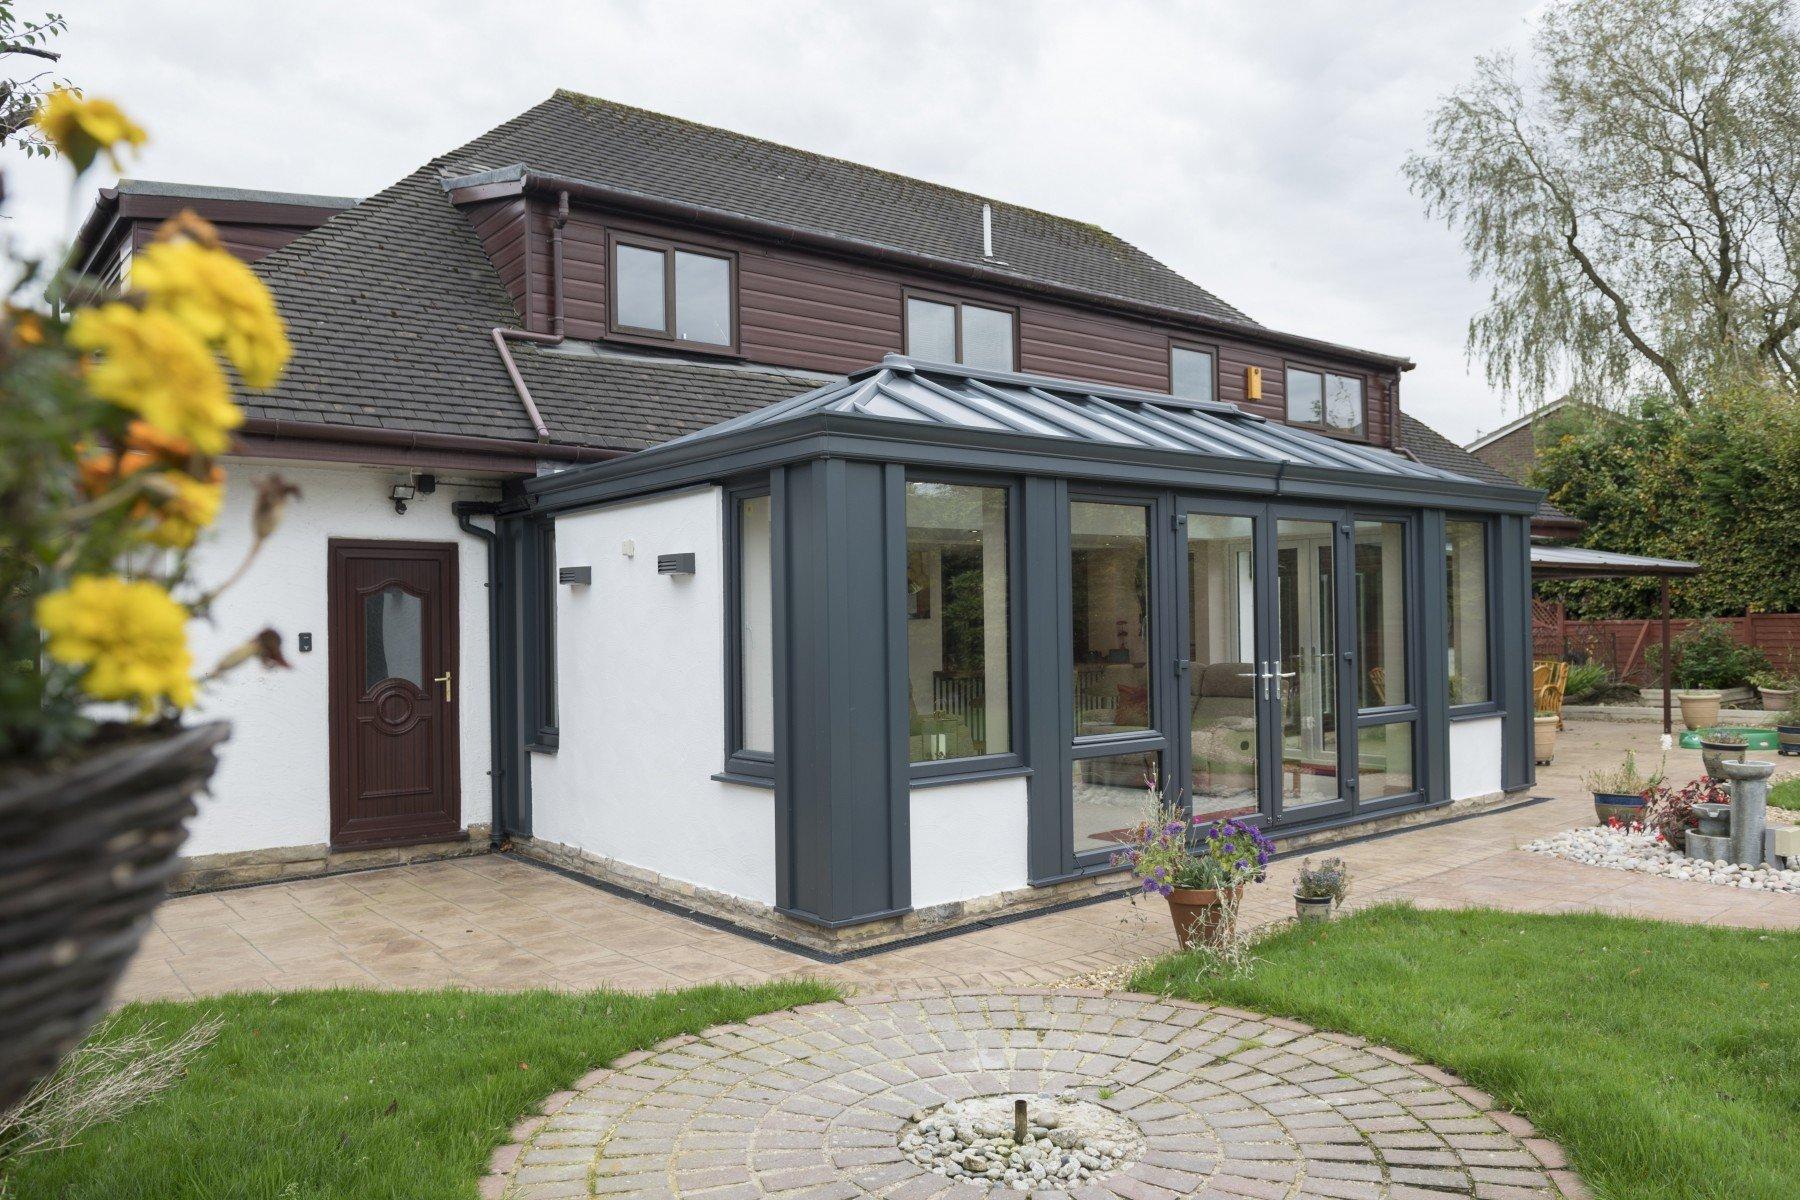 Home Extensions in Basingstoke